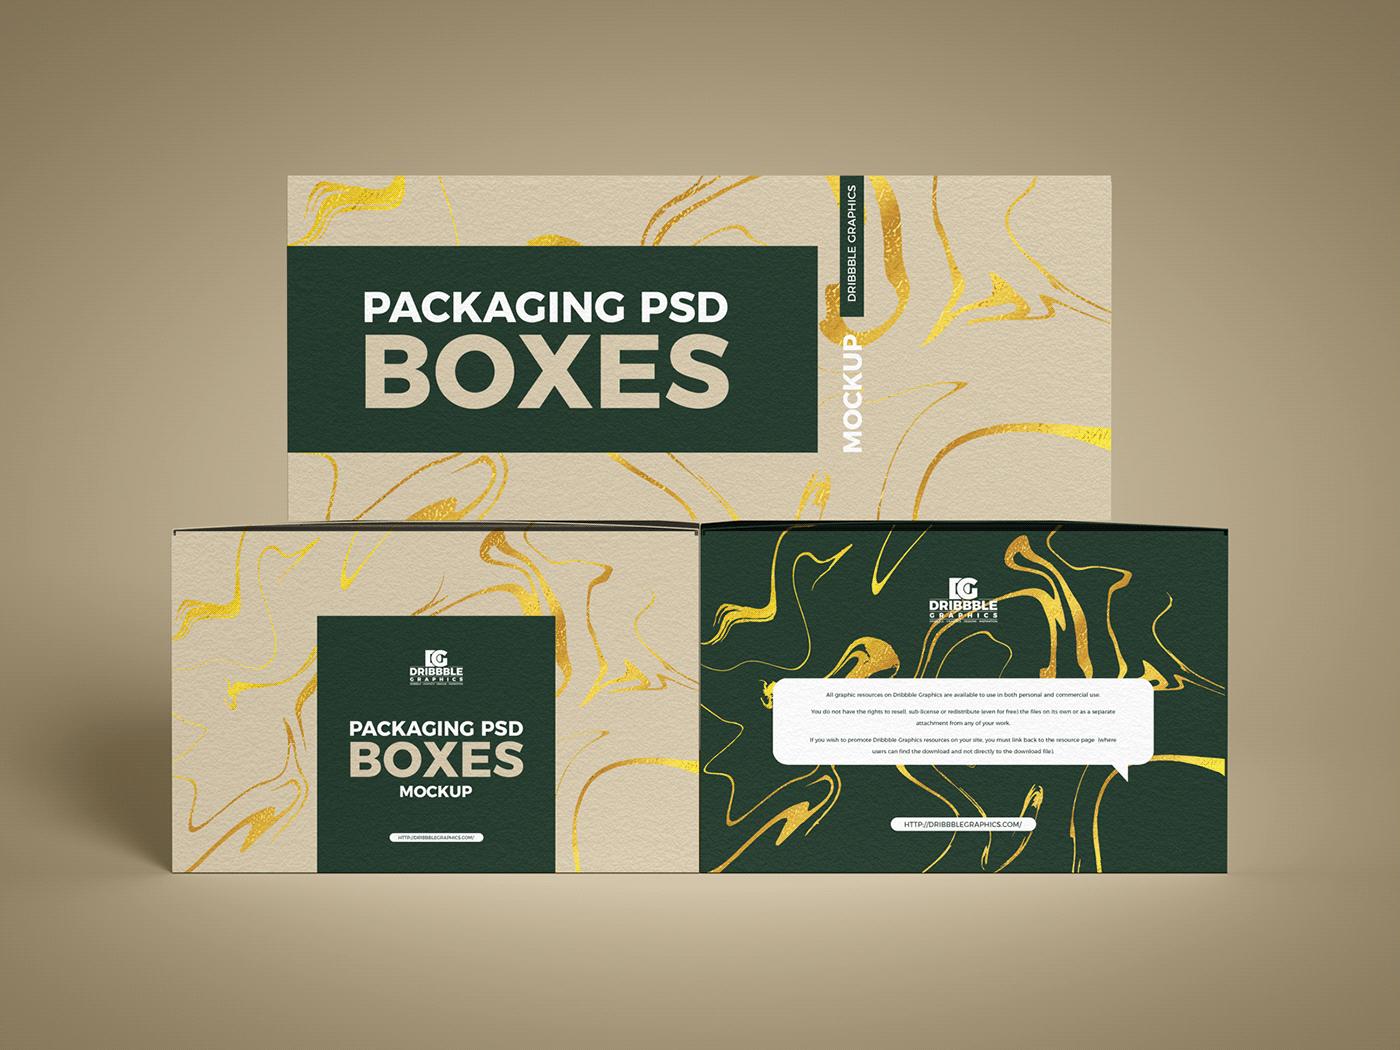 box mockup free mockup  freebies mock up Mockup mockup free mockup psd mockups packaging mockup psd